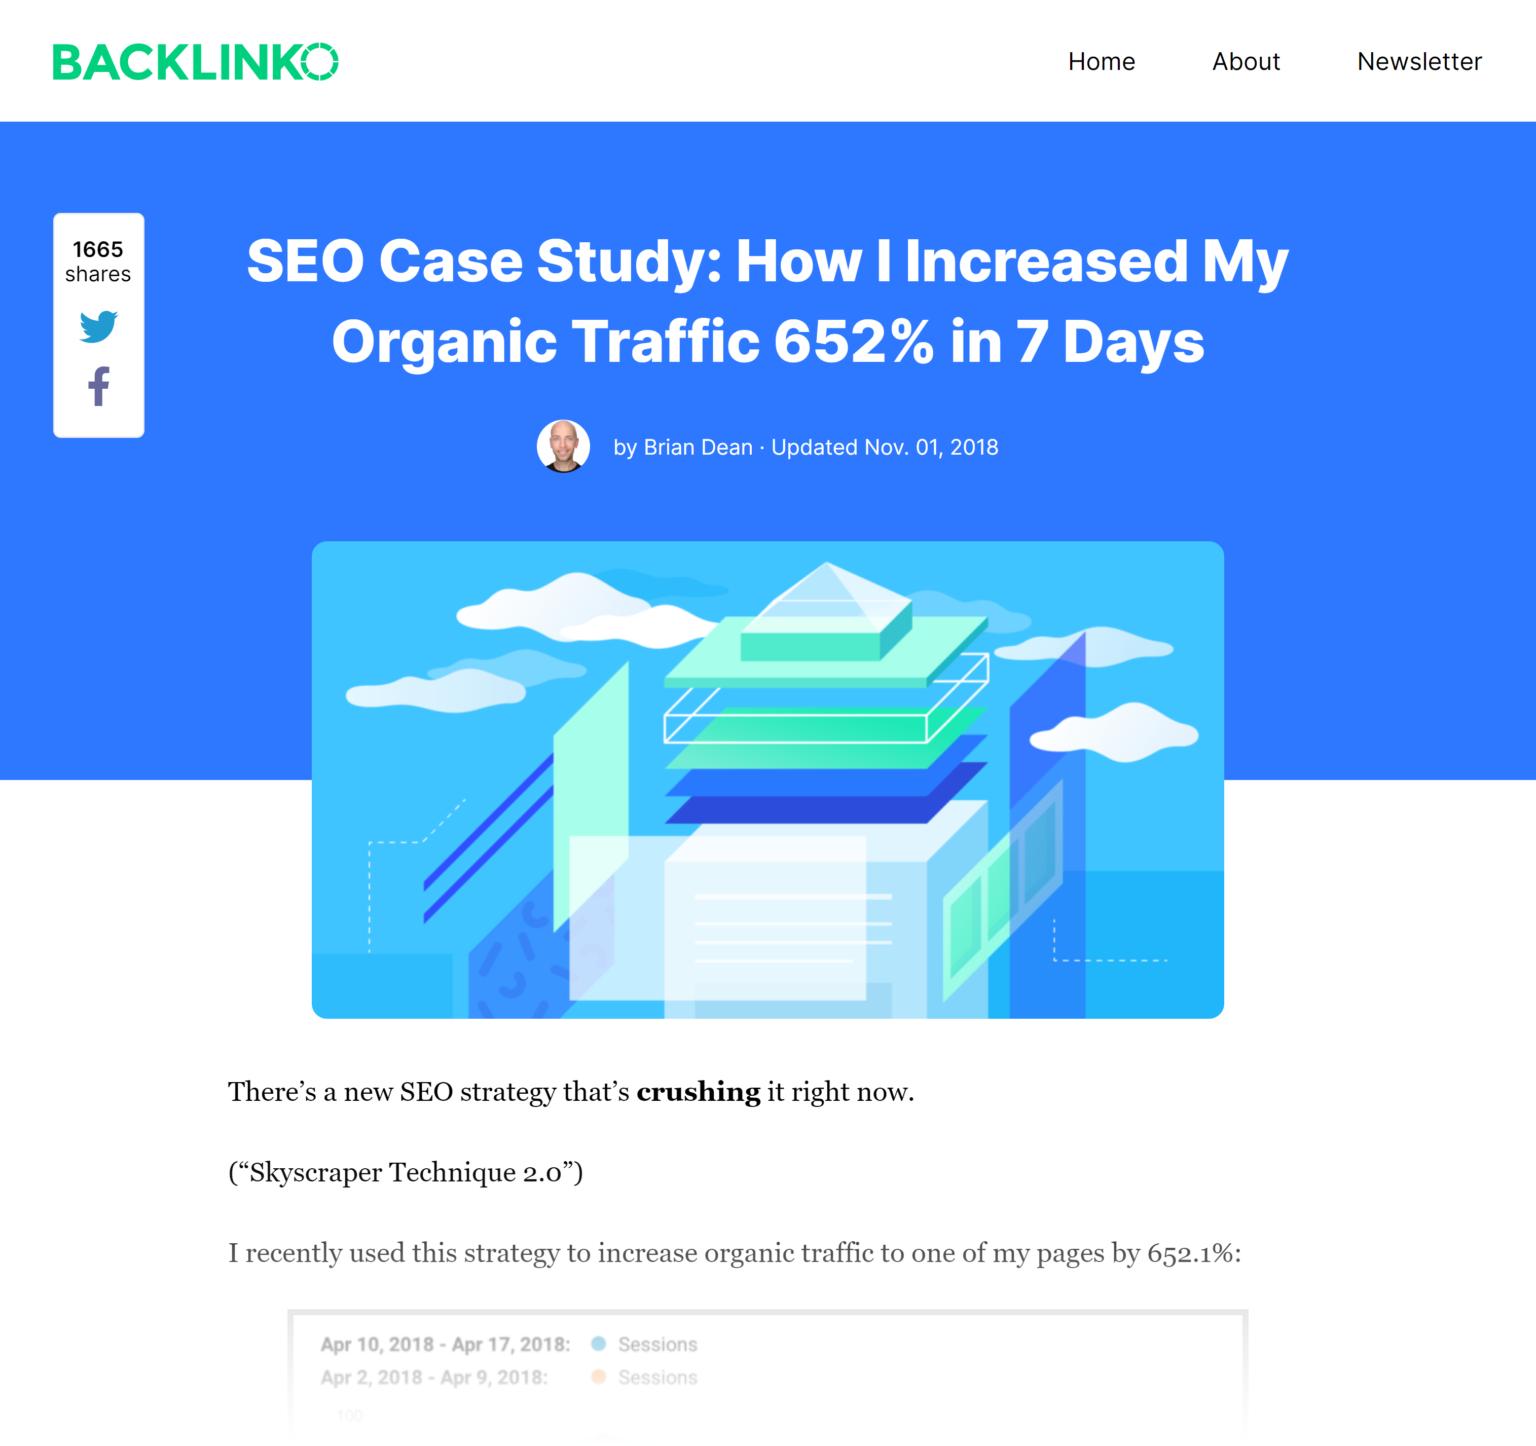 Backlinko - Техника небоскреба 2.0